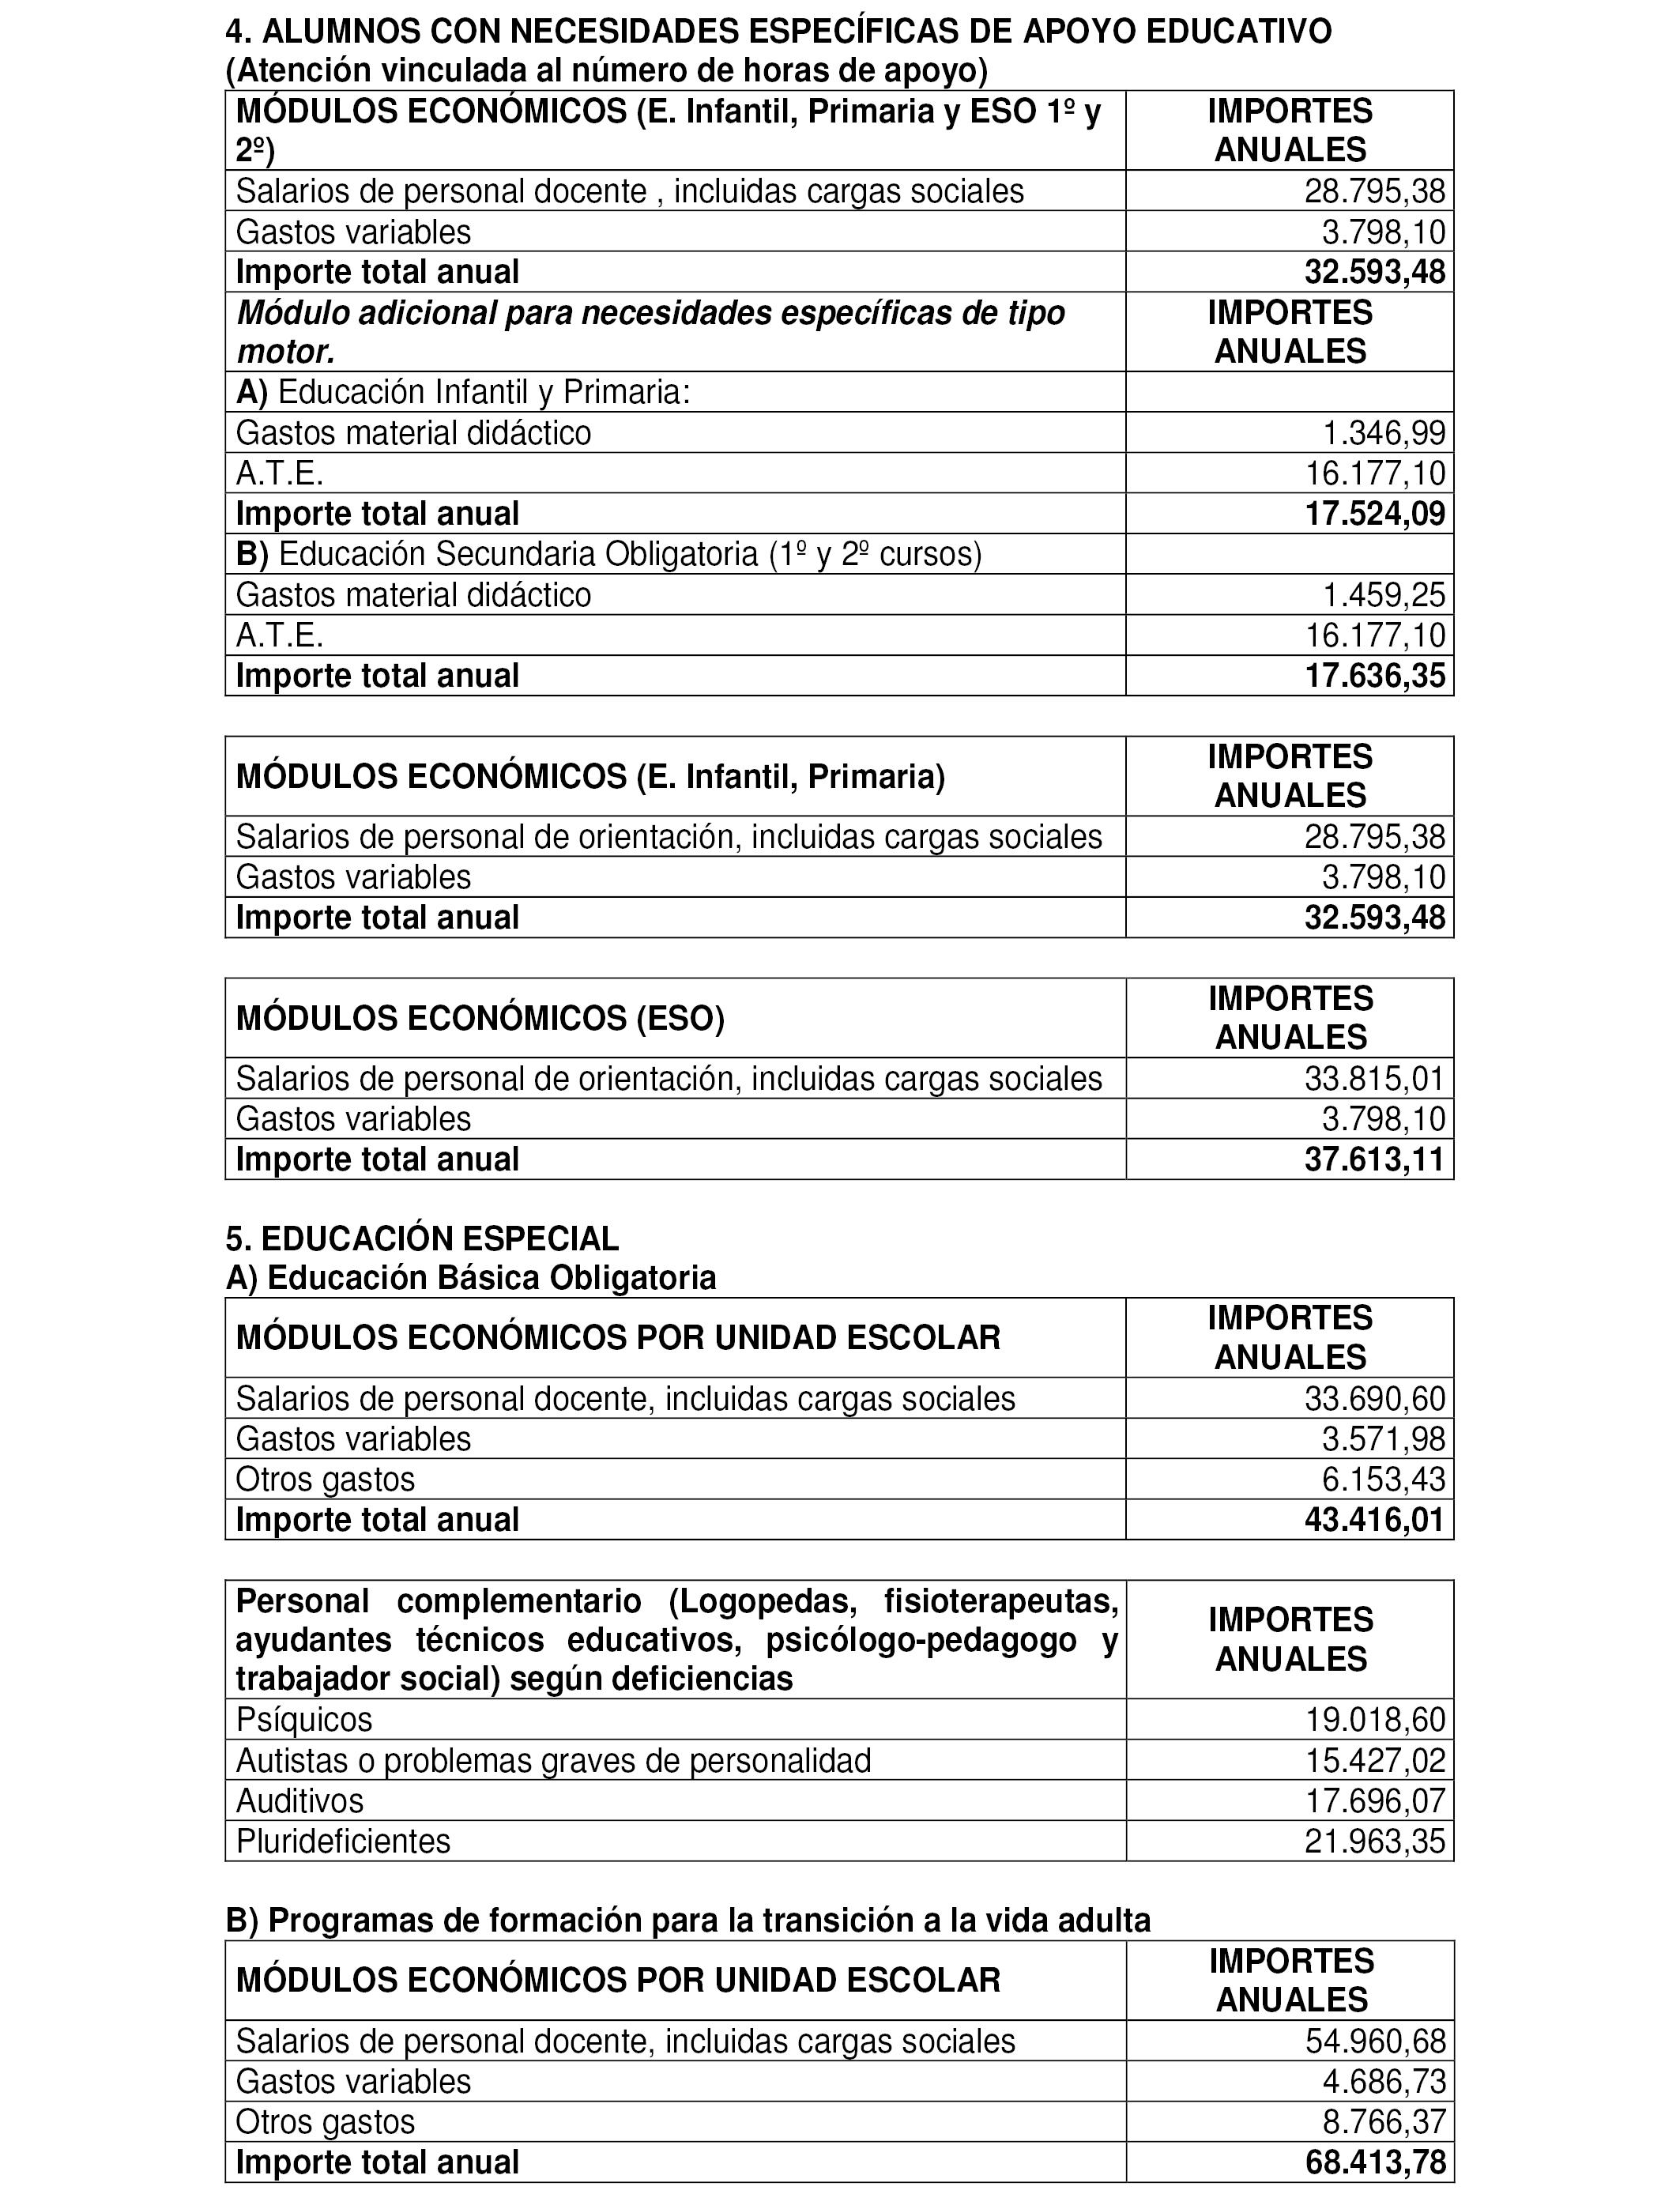 BOE.es - Documento BOE-A-2016-6723